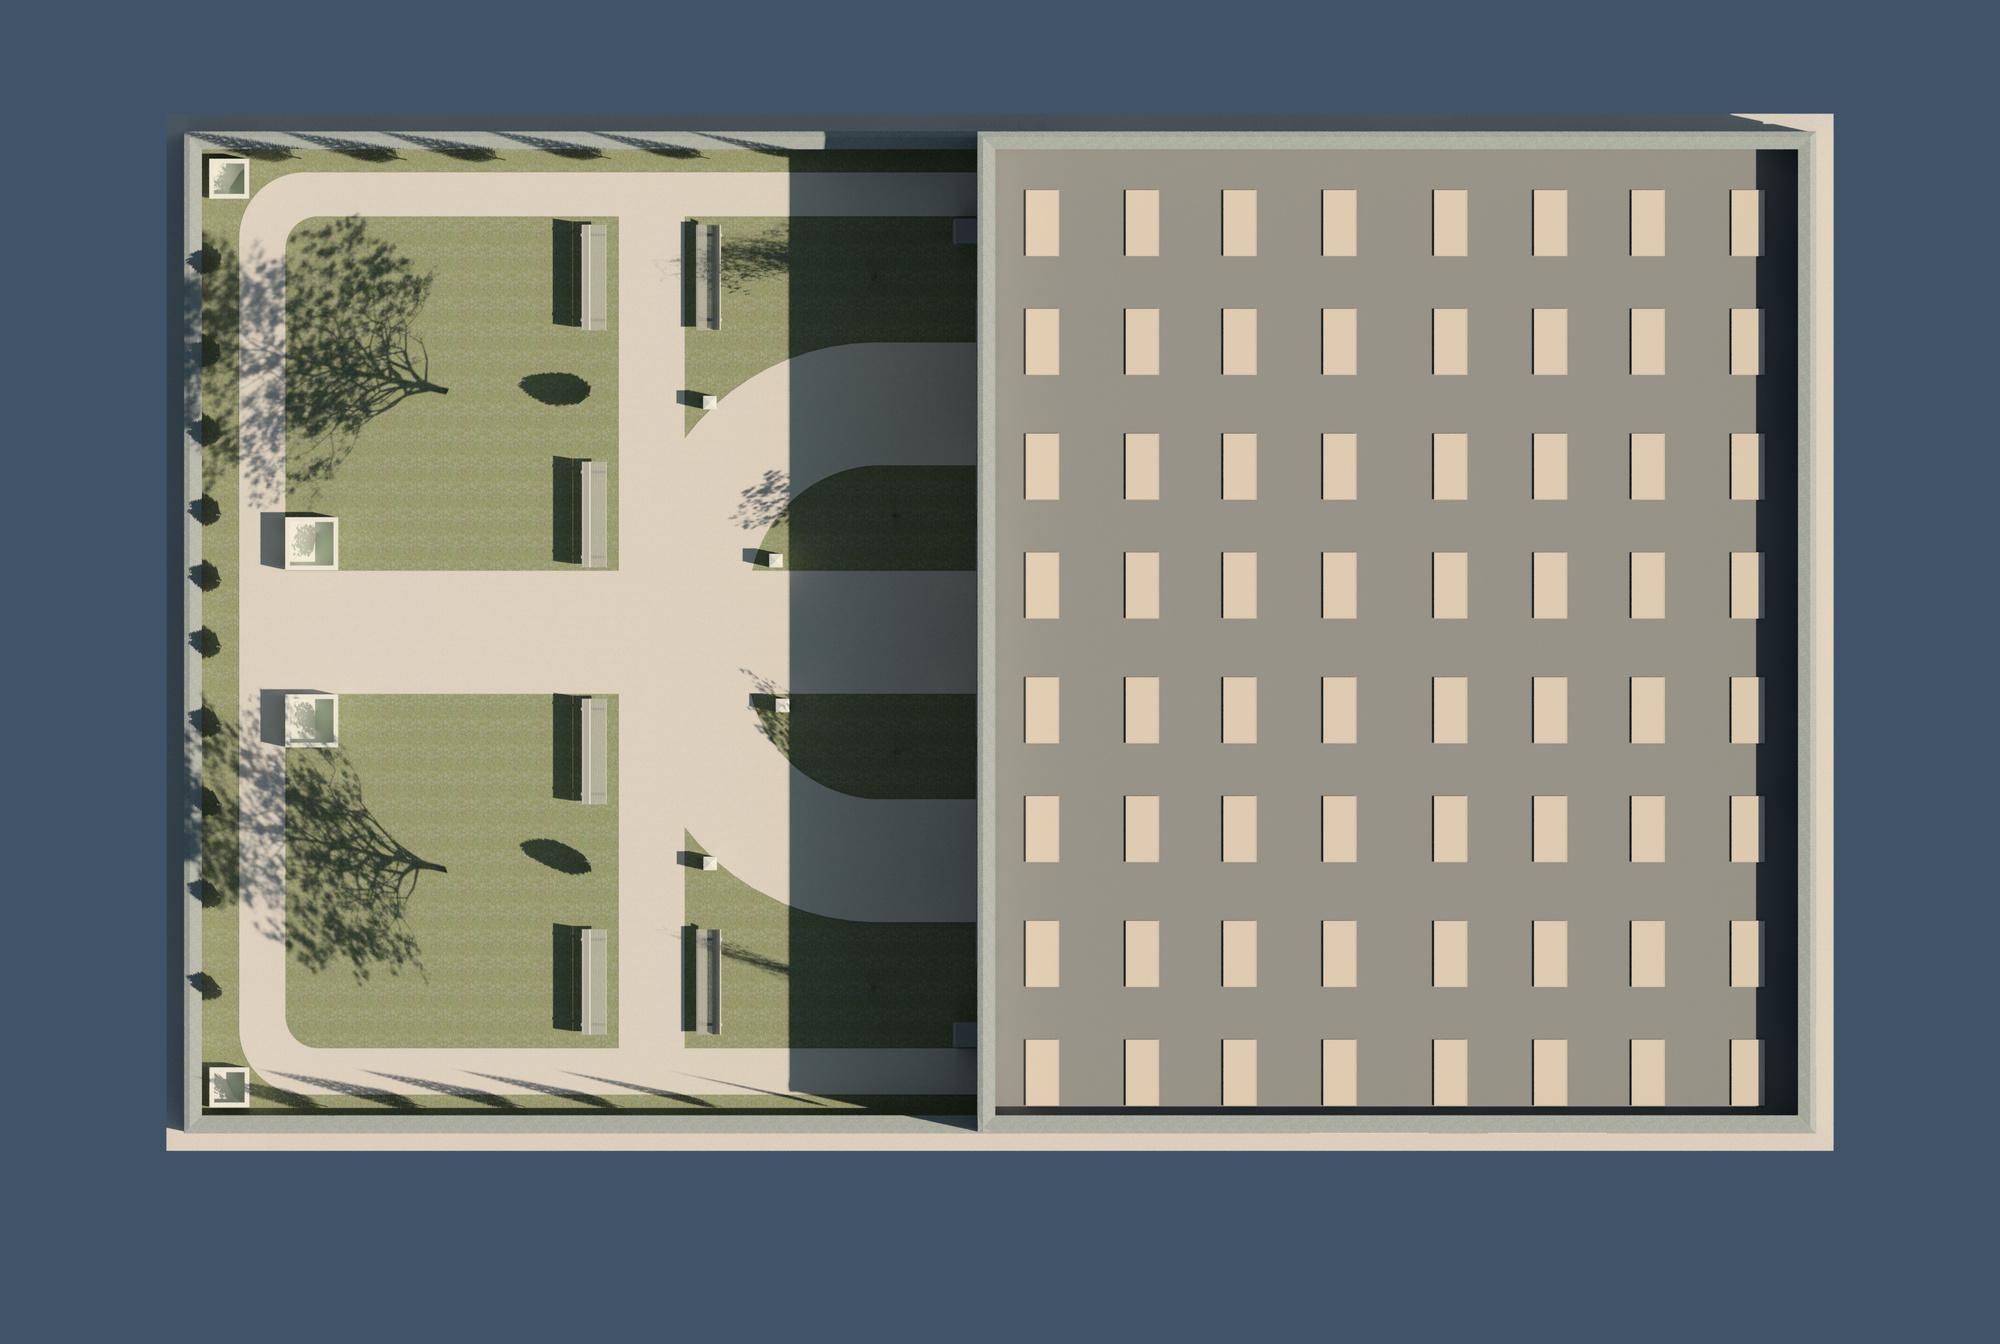 Raas-rendering20150324-31290-3qsrcr